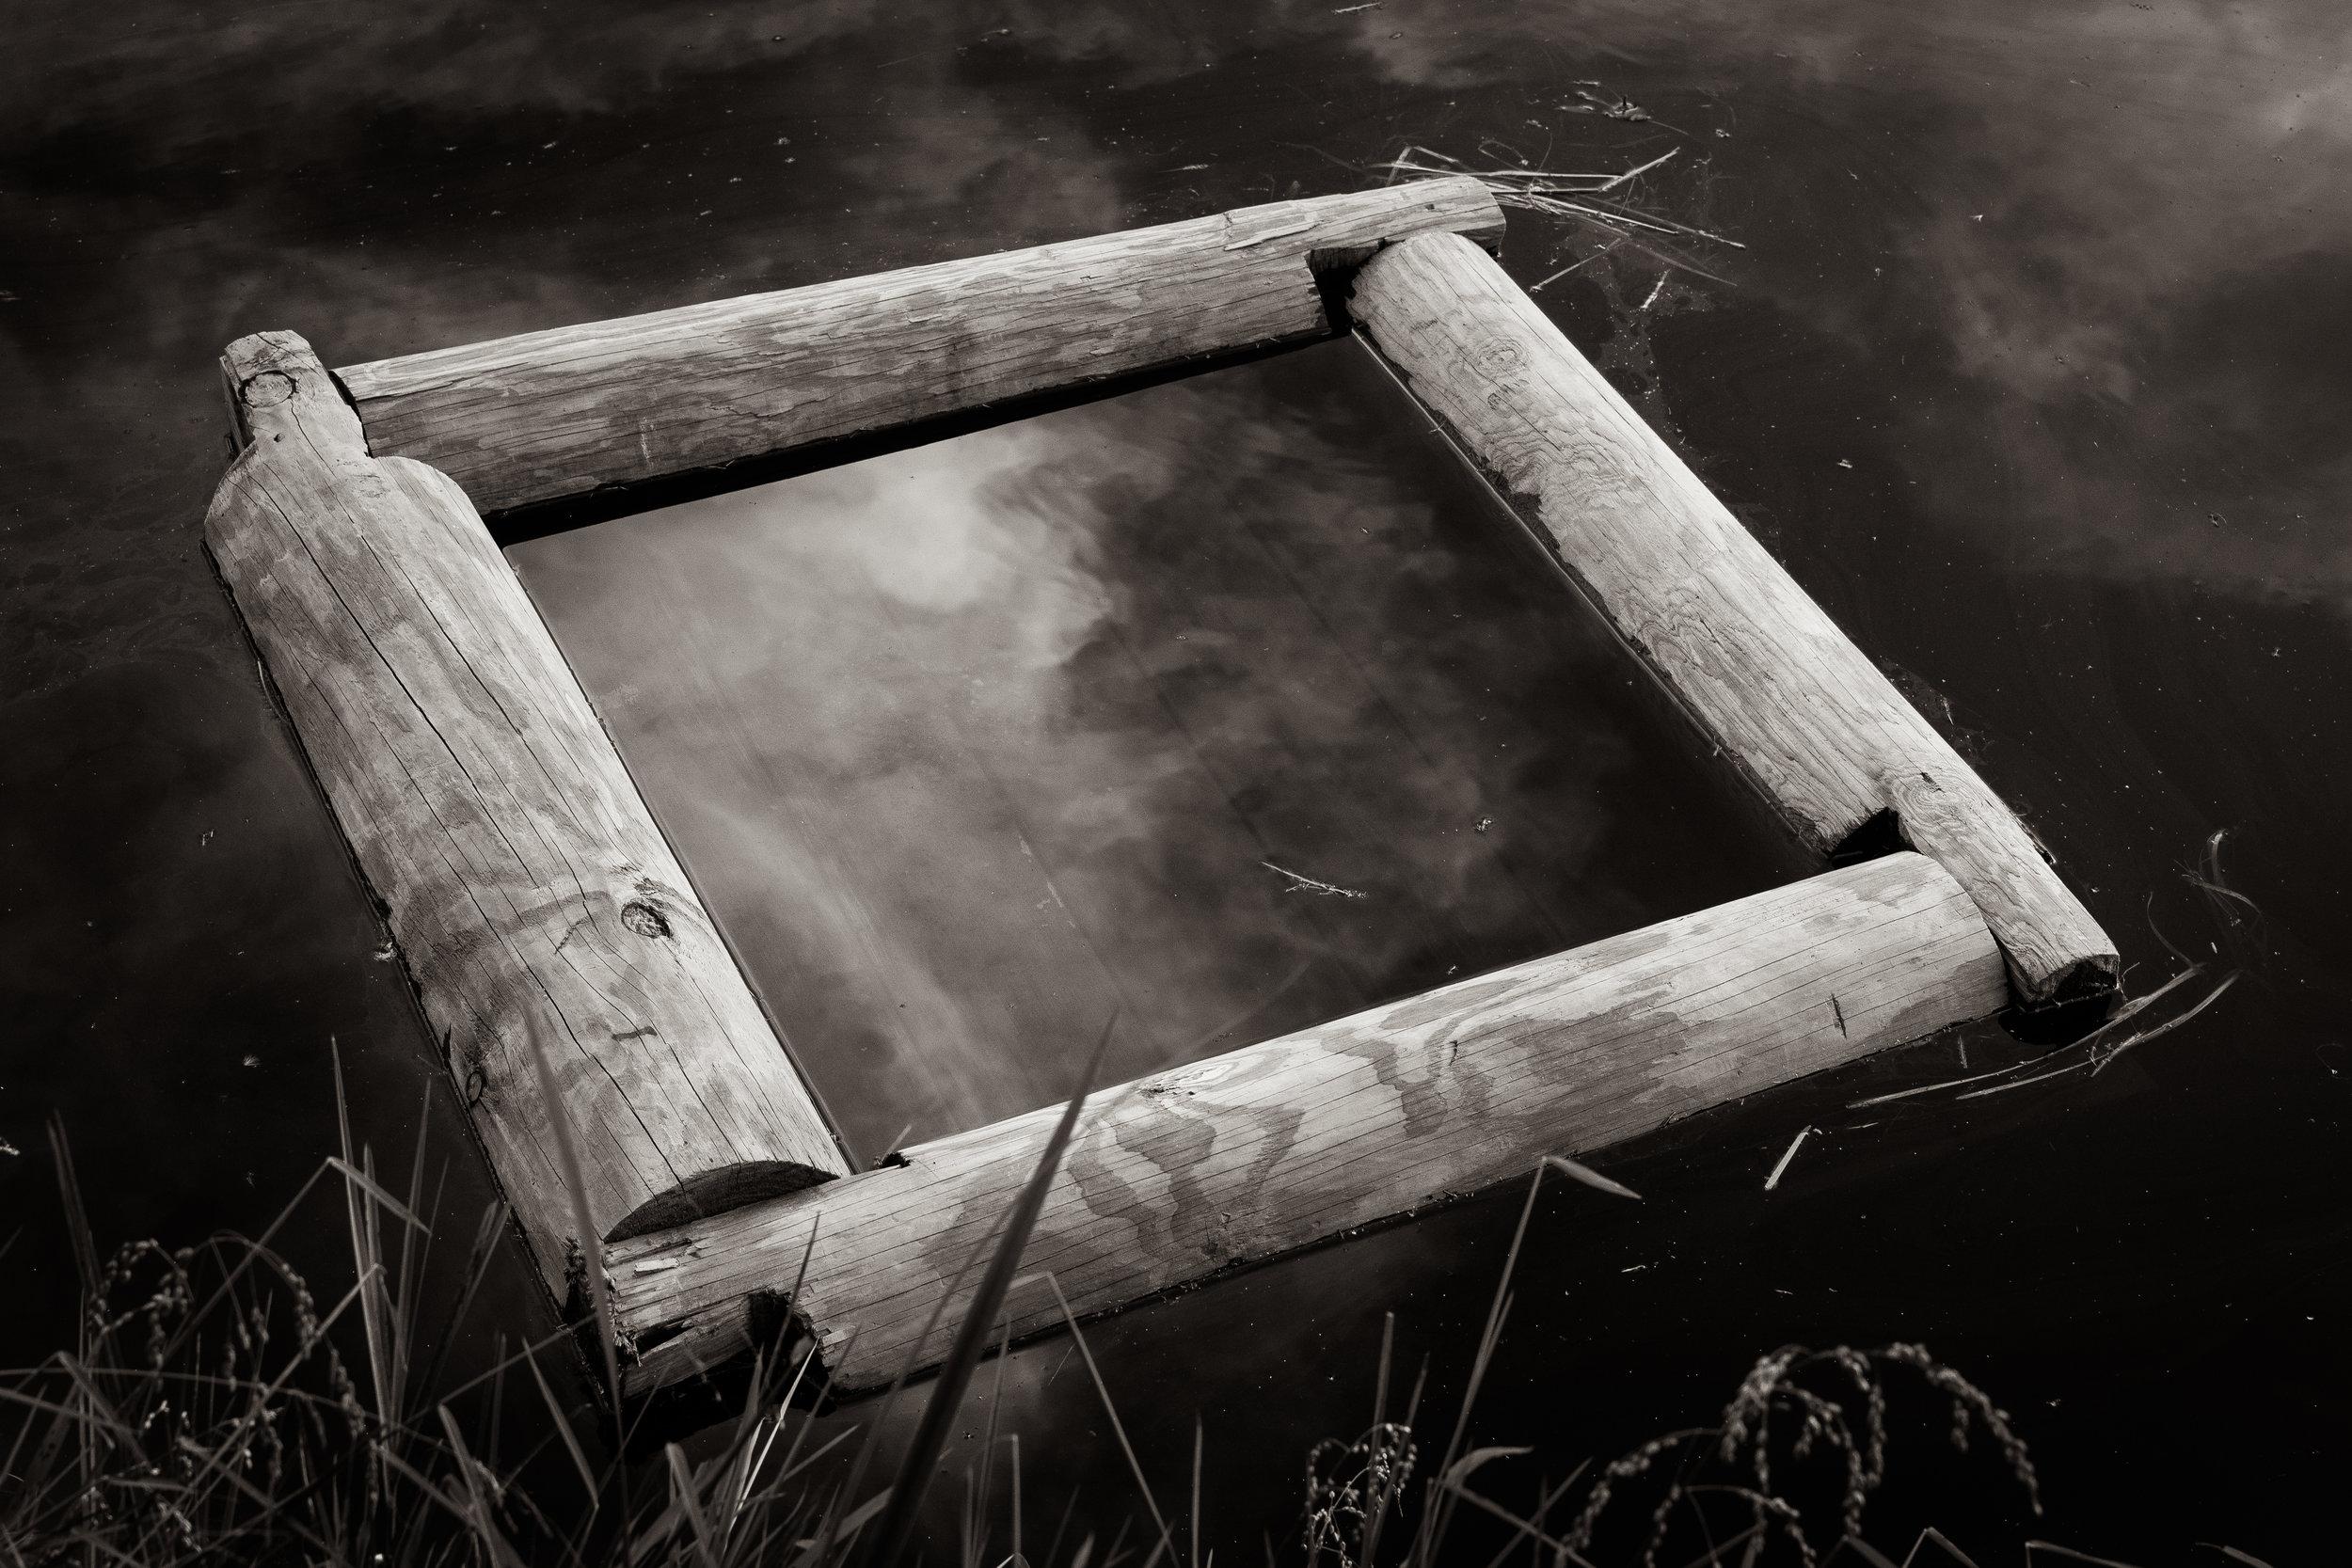 © Sal Taylor Kydd